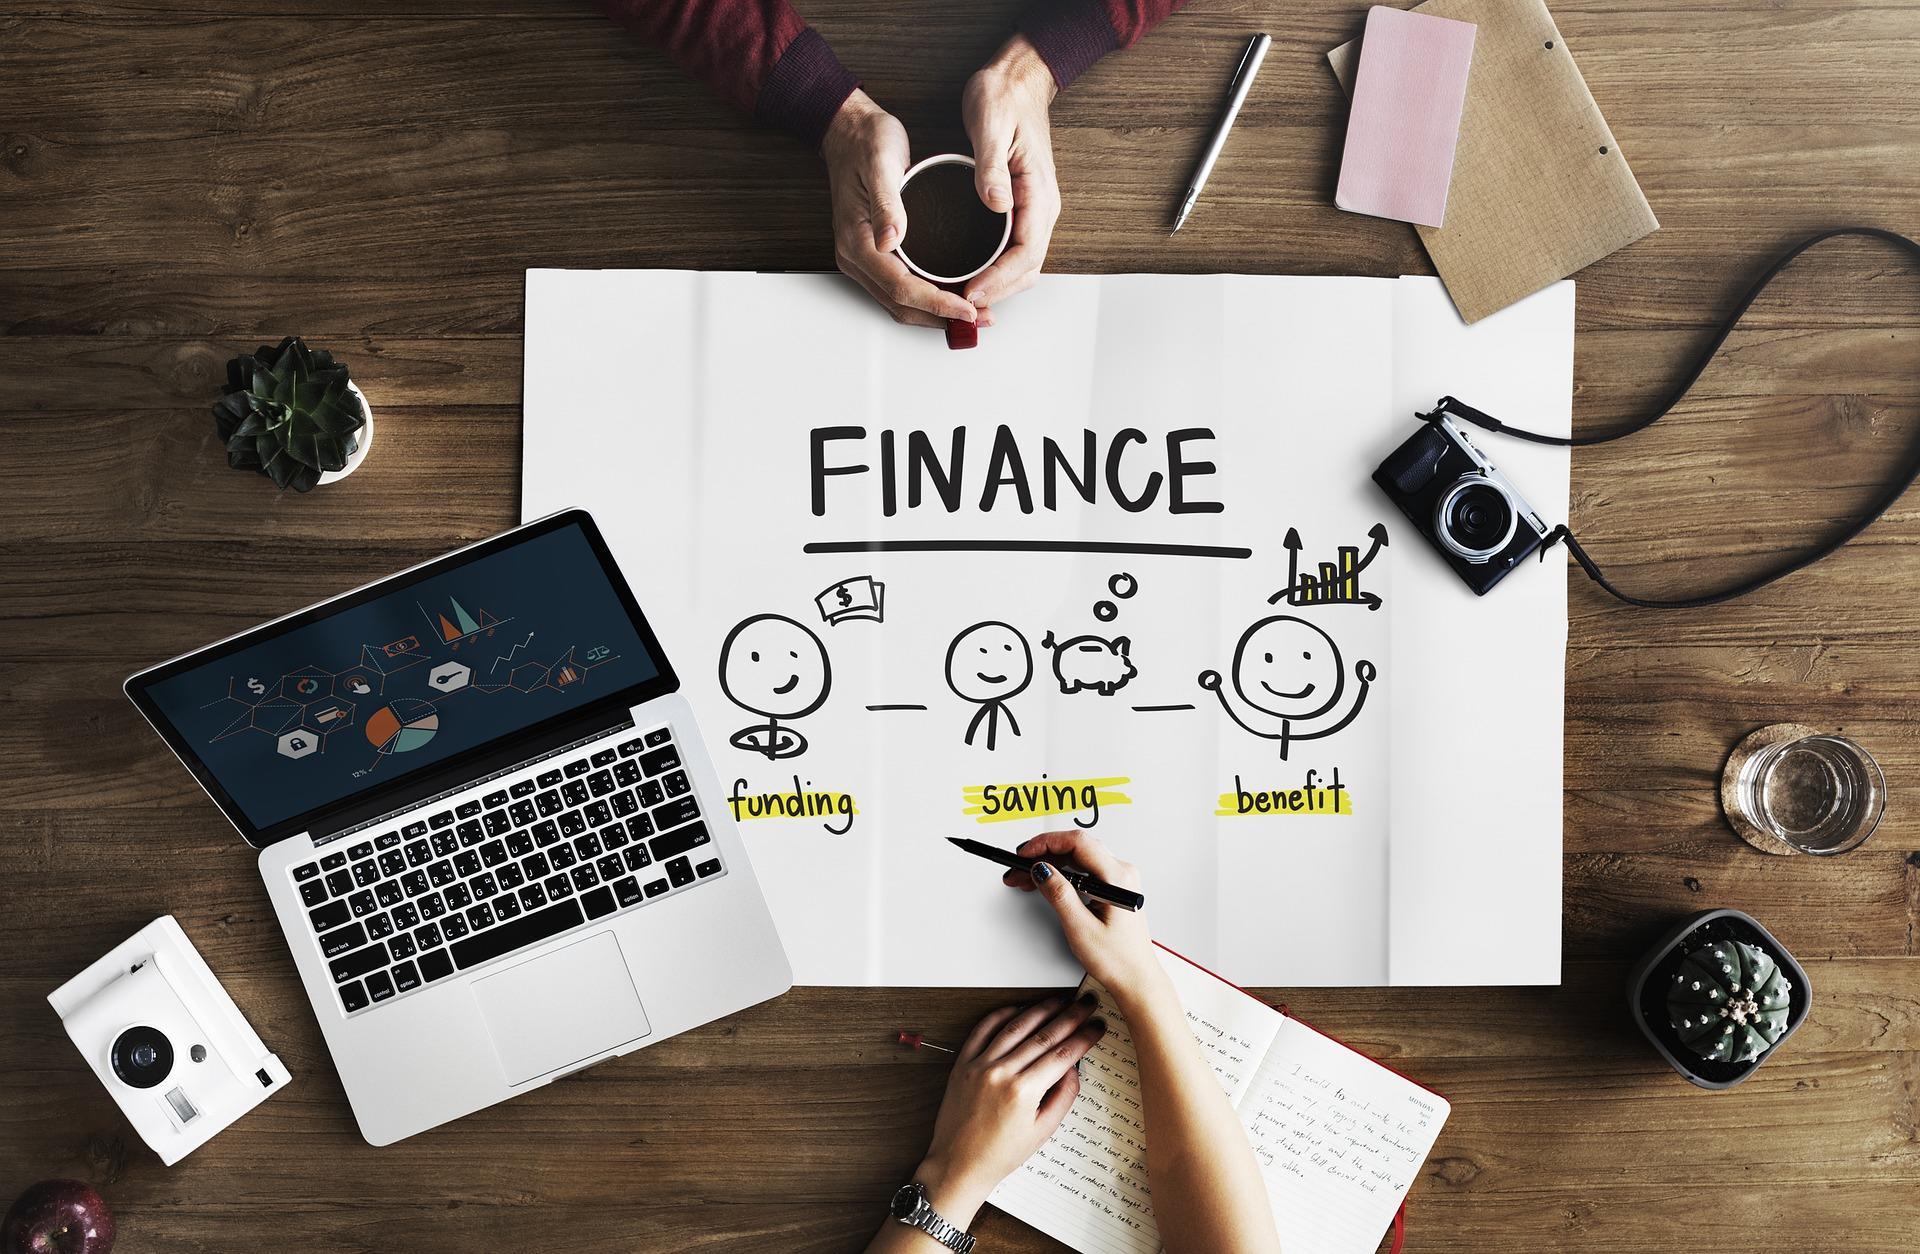 How Can I Better Manage My Online Spending? - Rachel Nicole UK Blogger